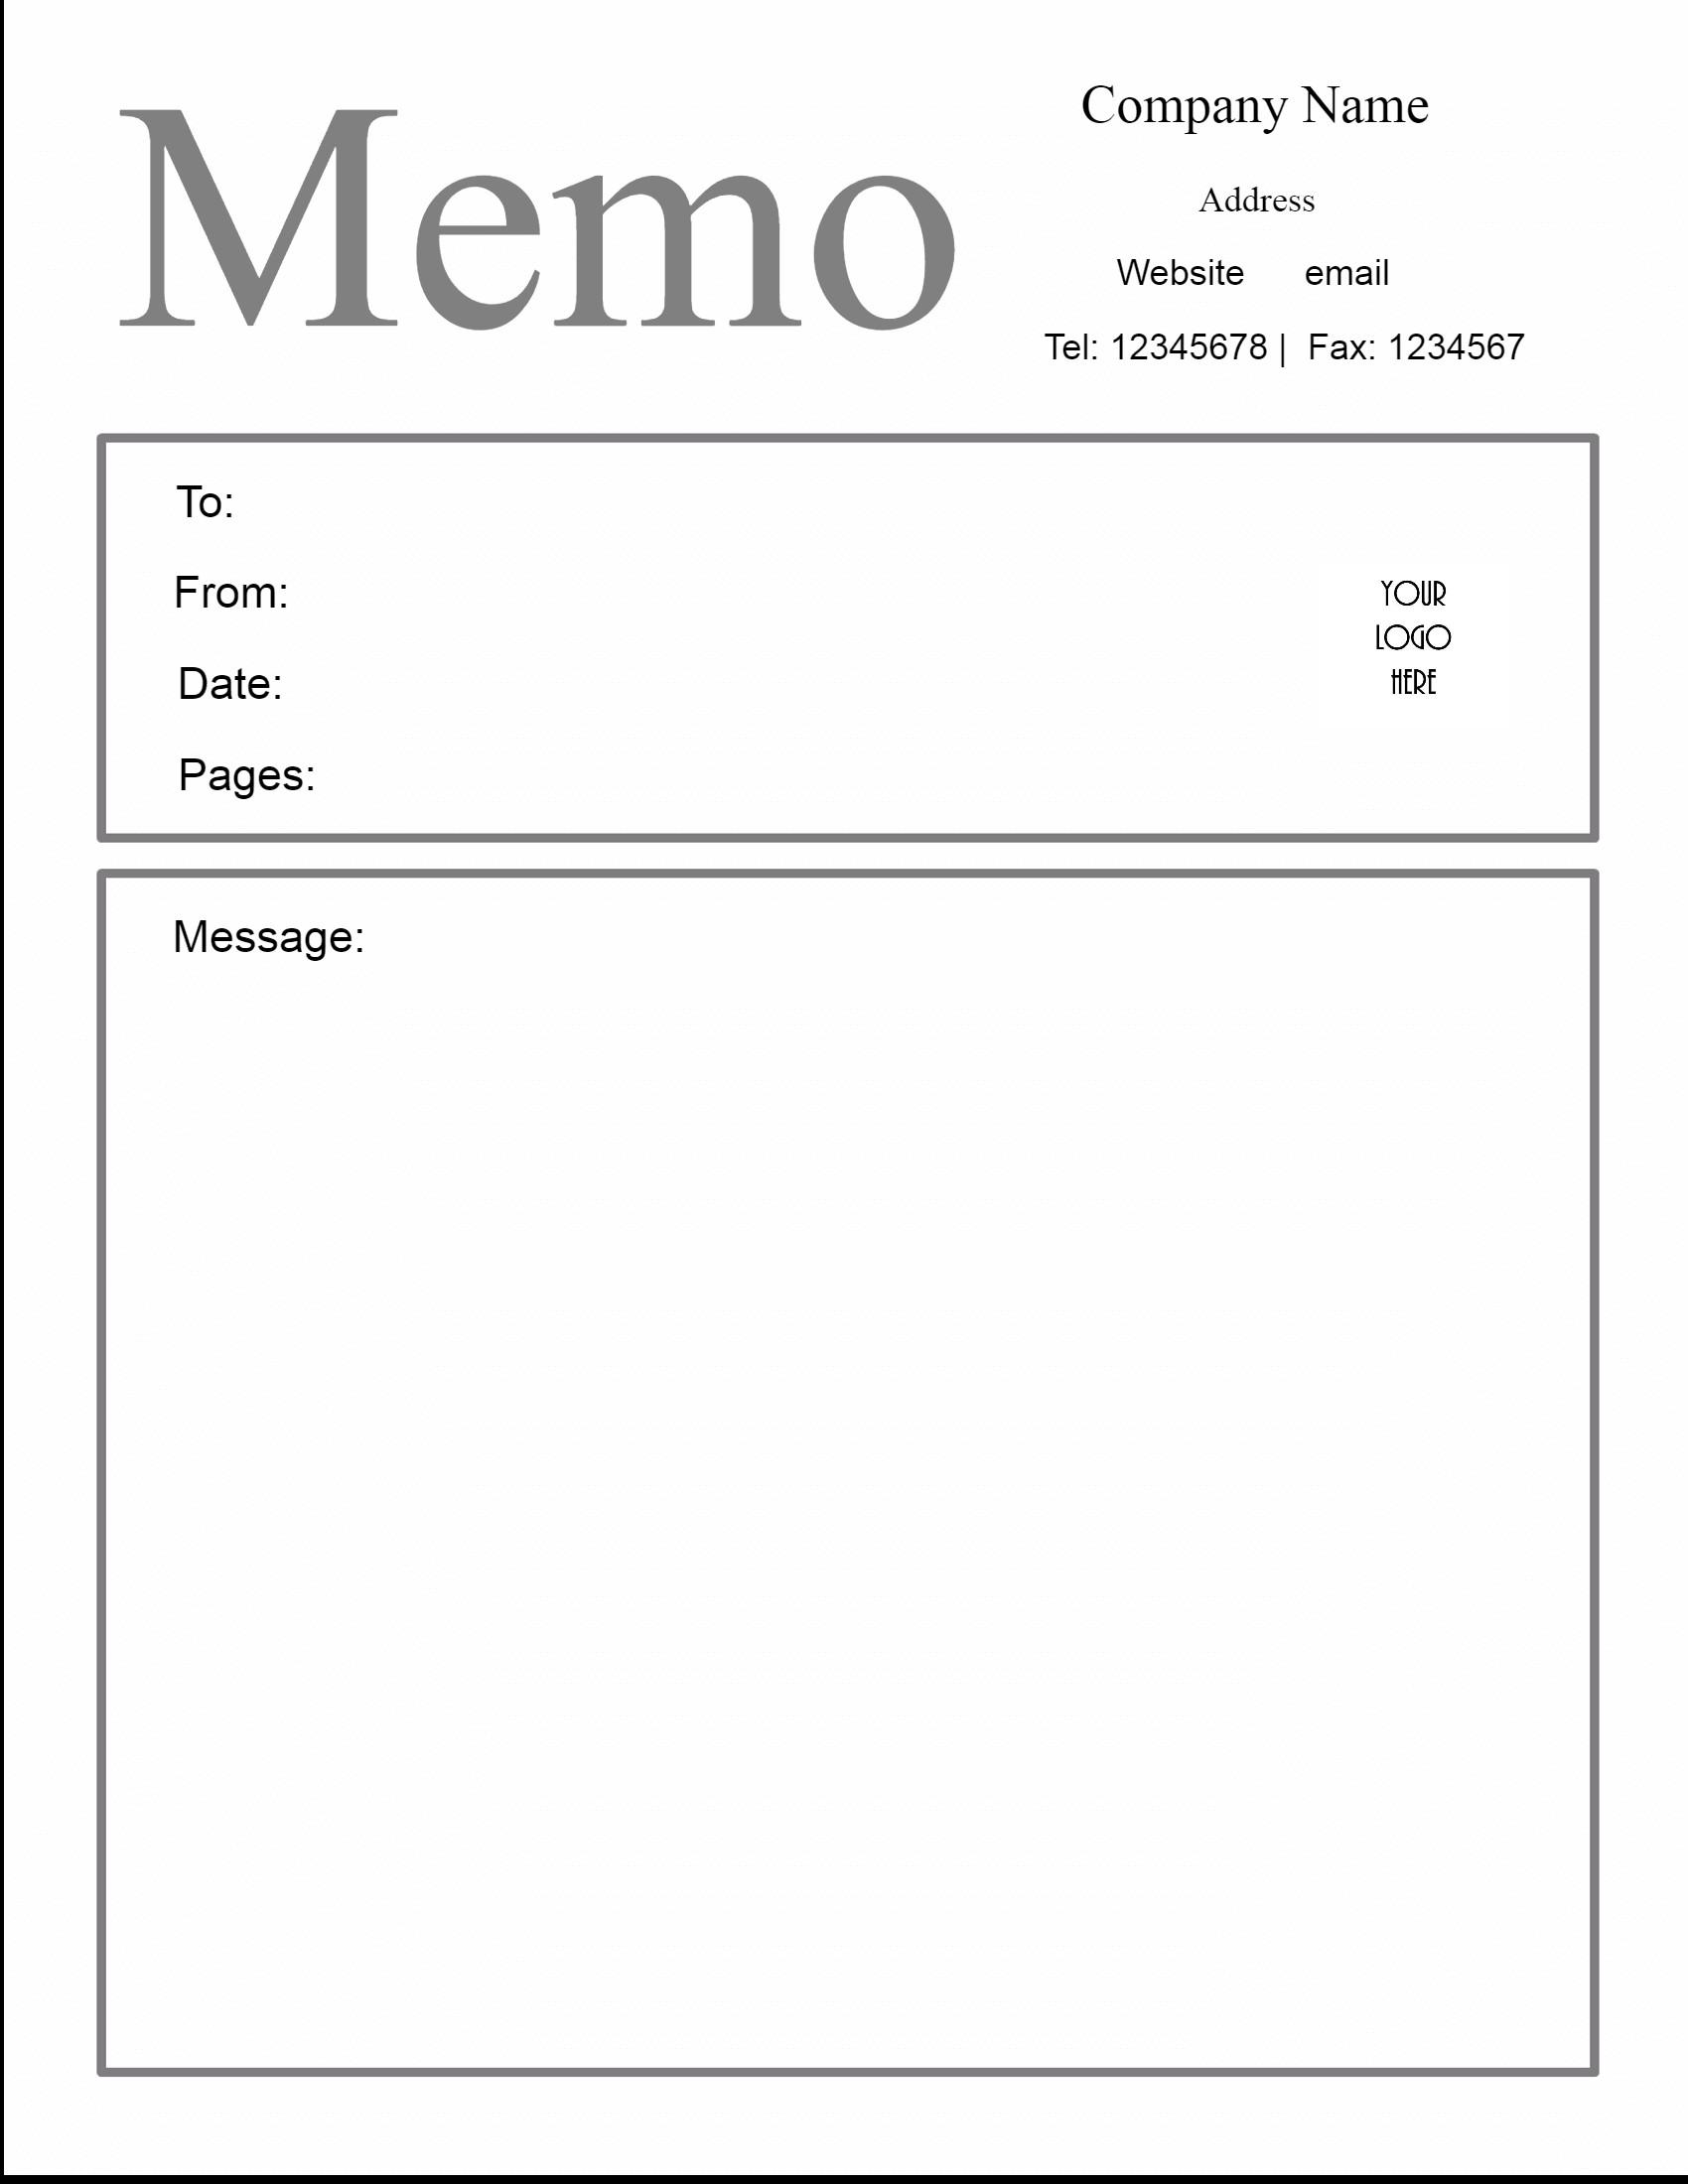 Microsoft Word Memo Templates Free Microsoft Word Memo Template